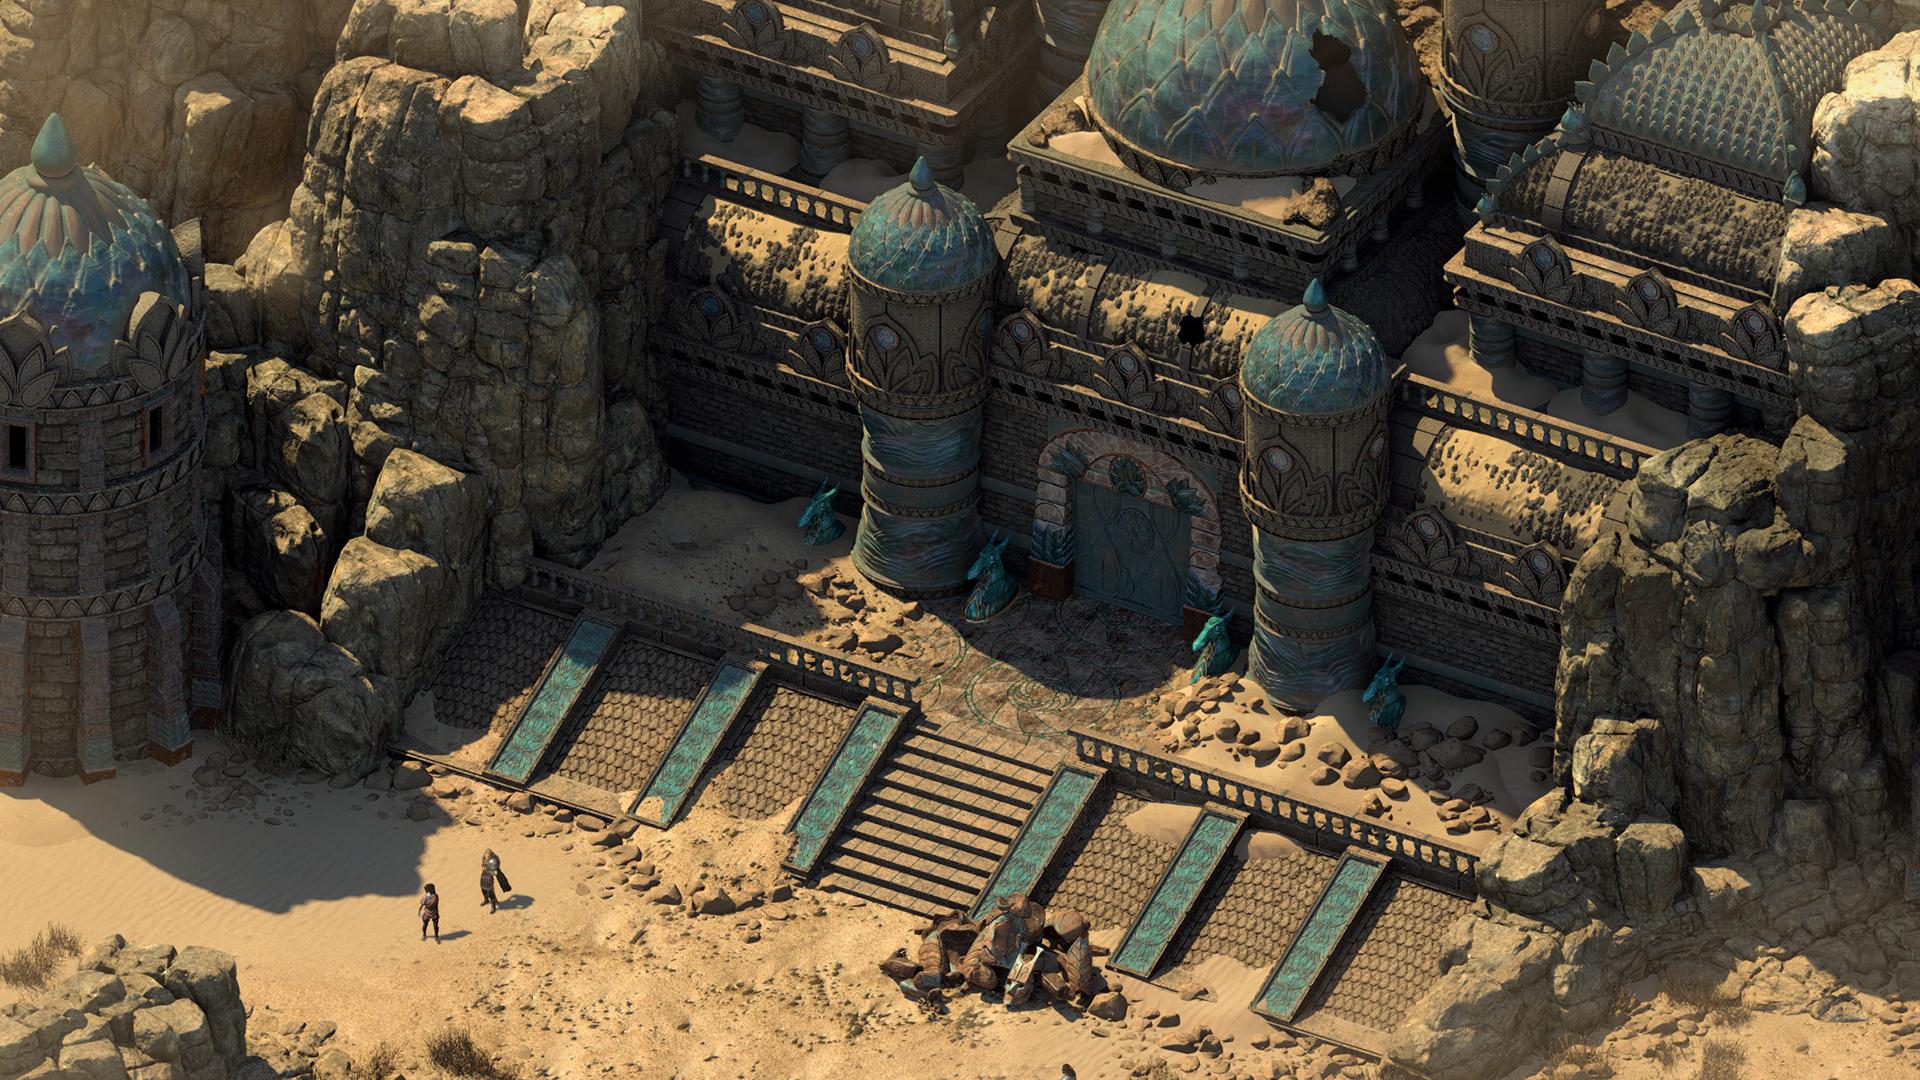 Obsidian Announces Pillars Of Eternity 2 Polygon Pillars Of